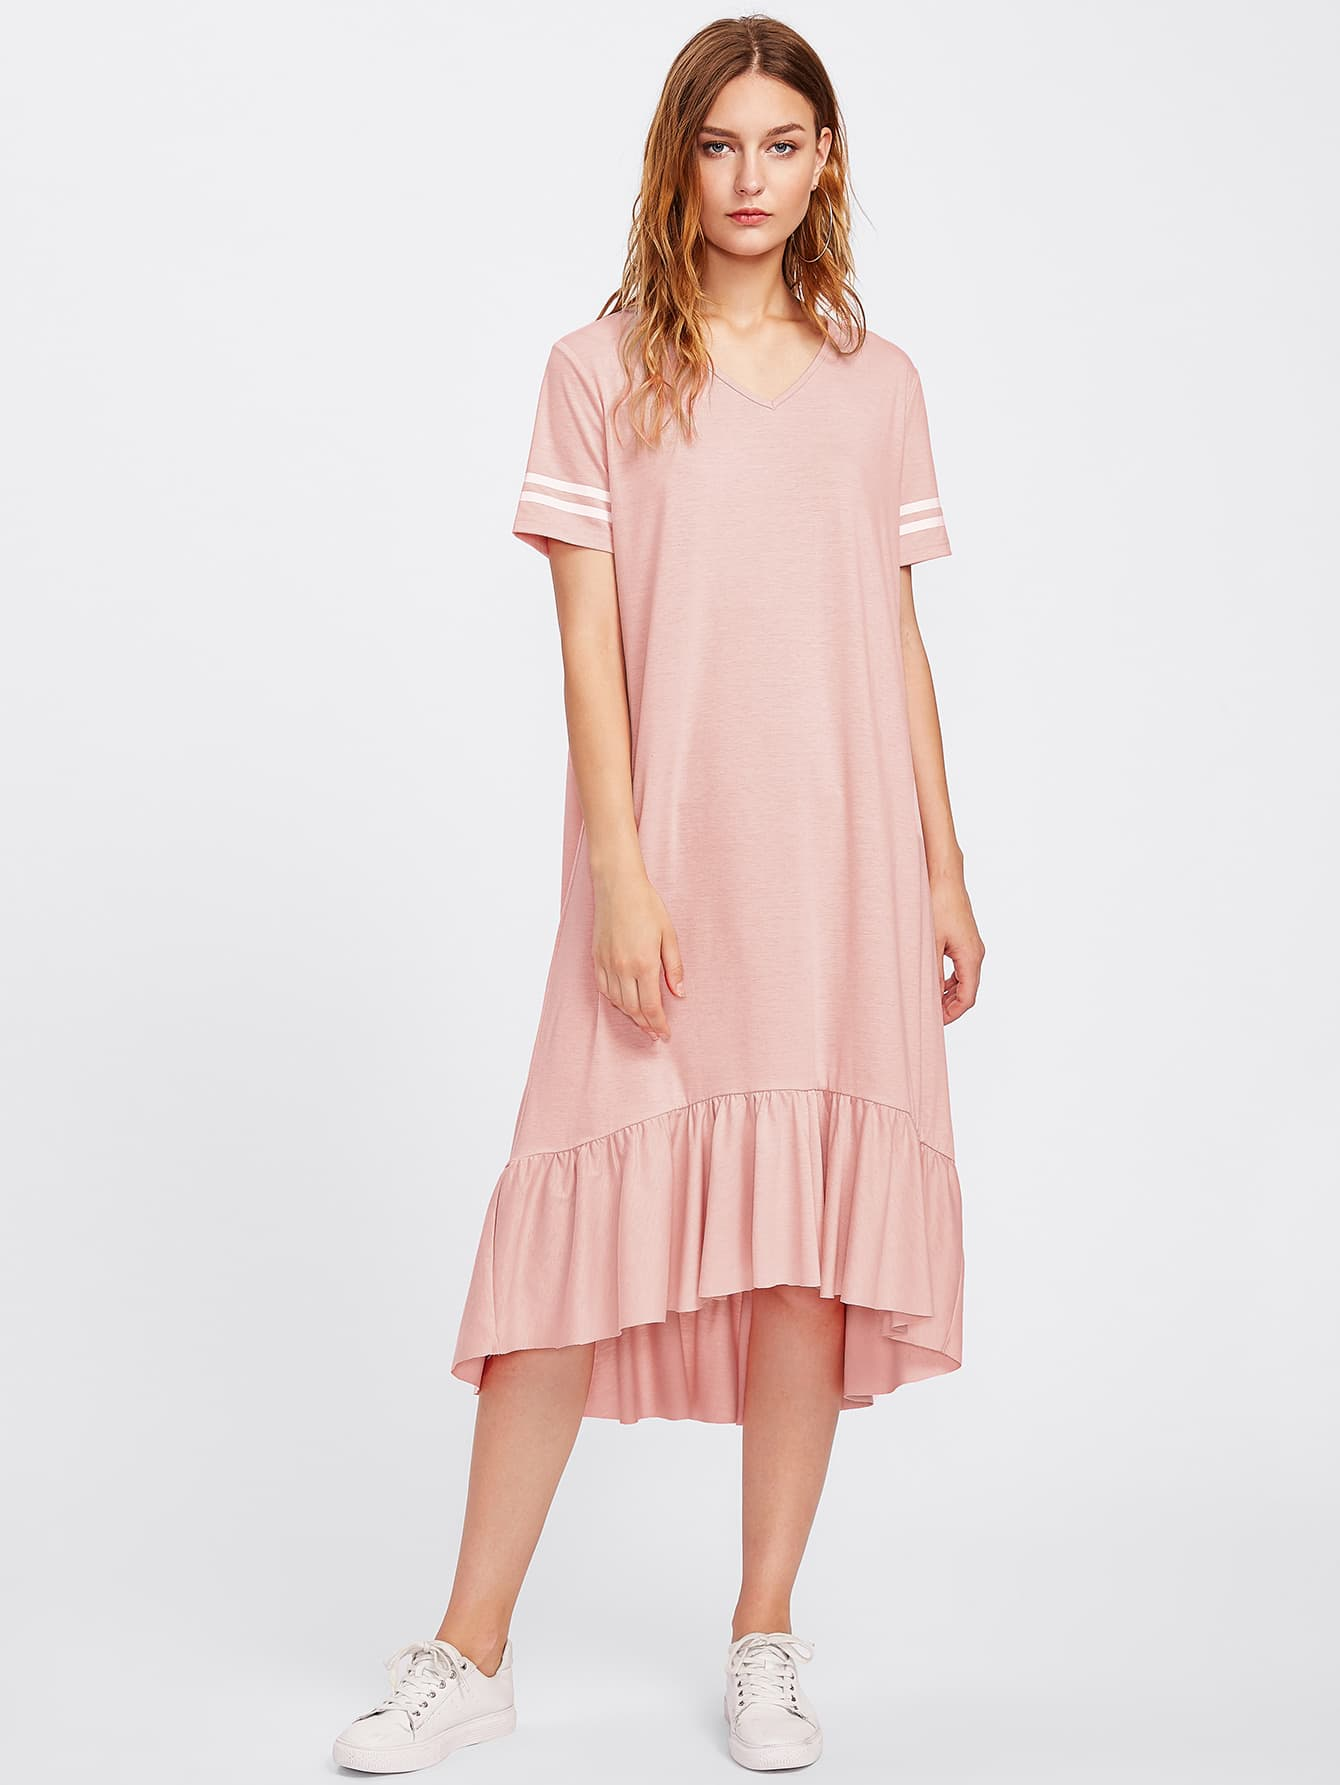 Striped Sleeve Flounce Hem Heathered Tee Dress